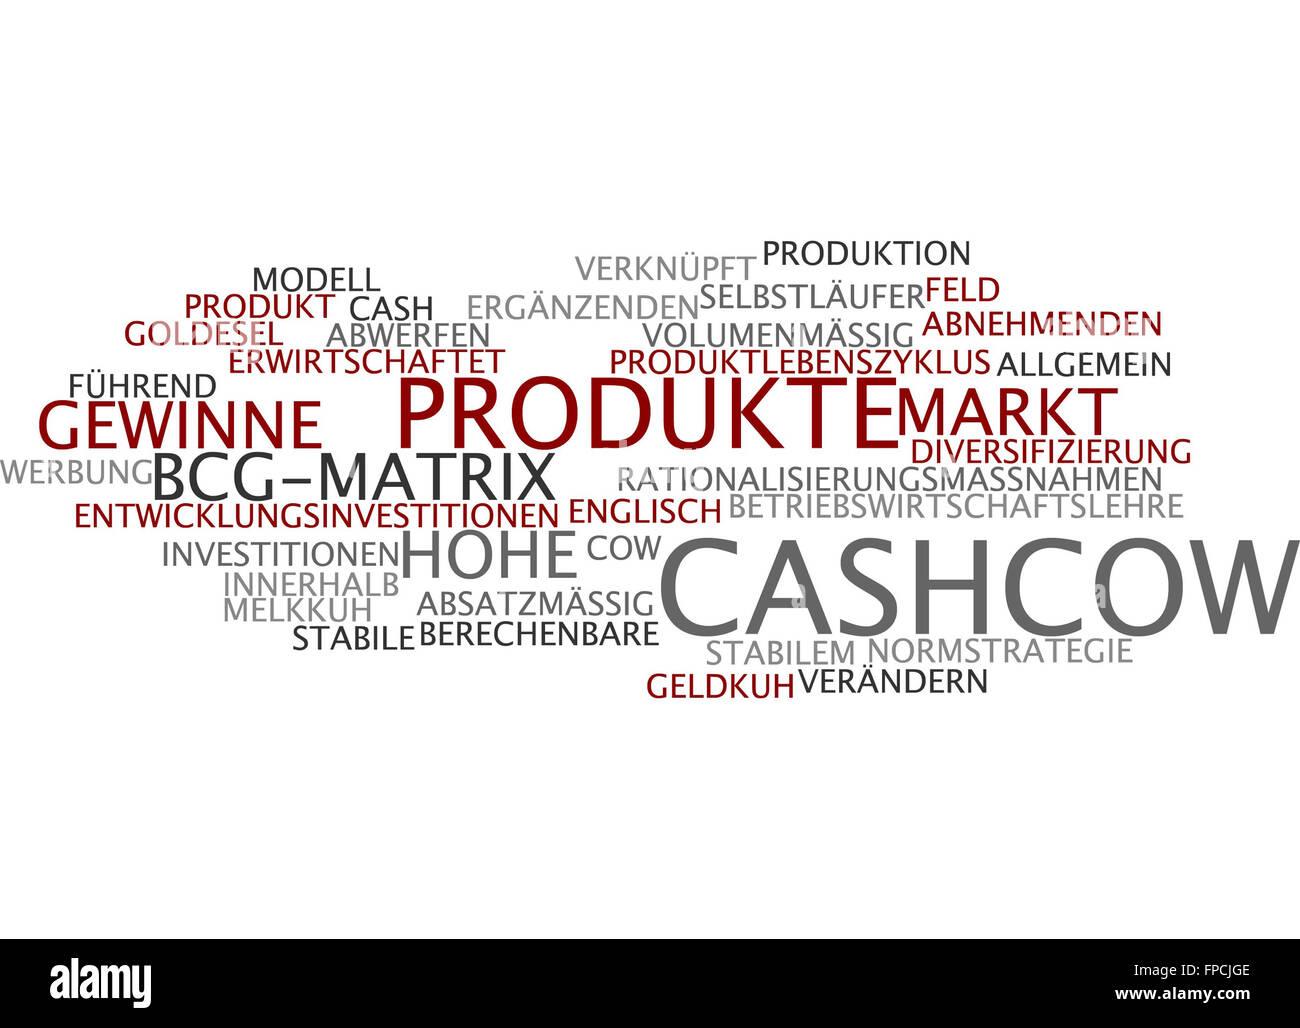 Cashcow Cashkuh Kuh Cow Cash Geld Gewinn - Stock Image